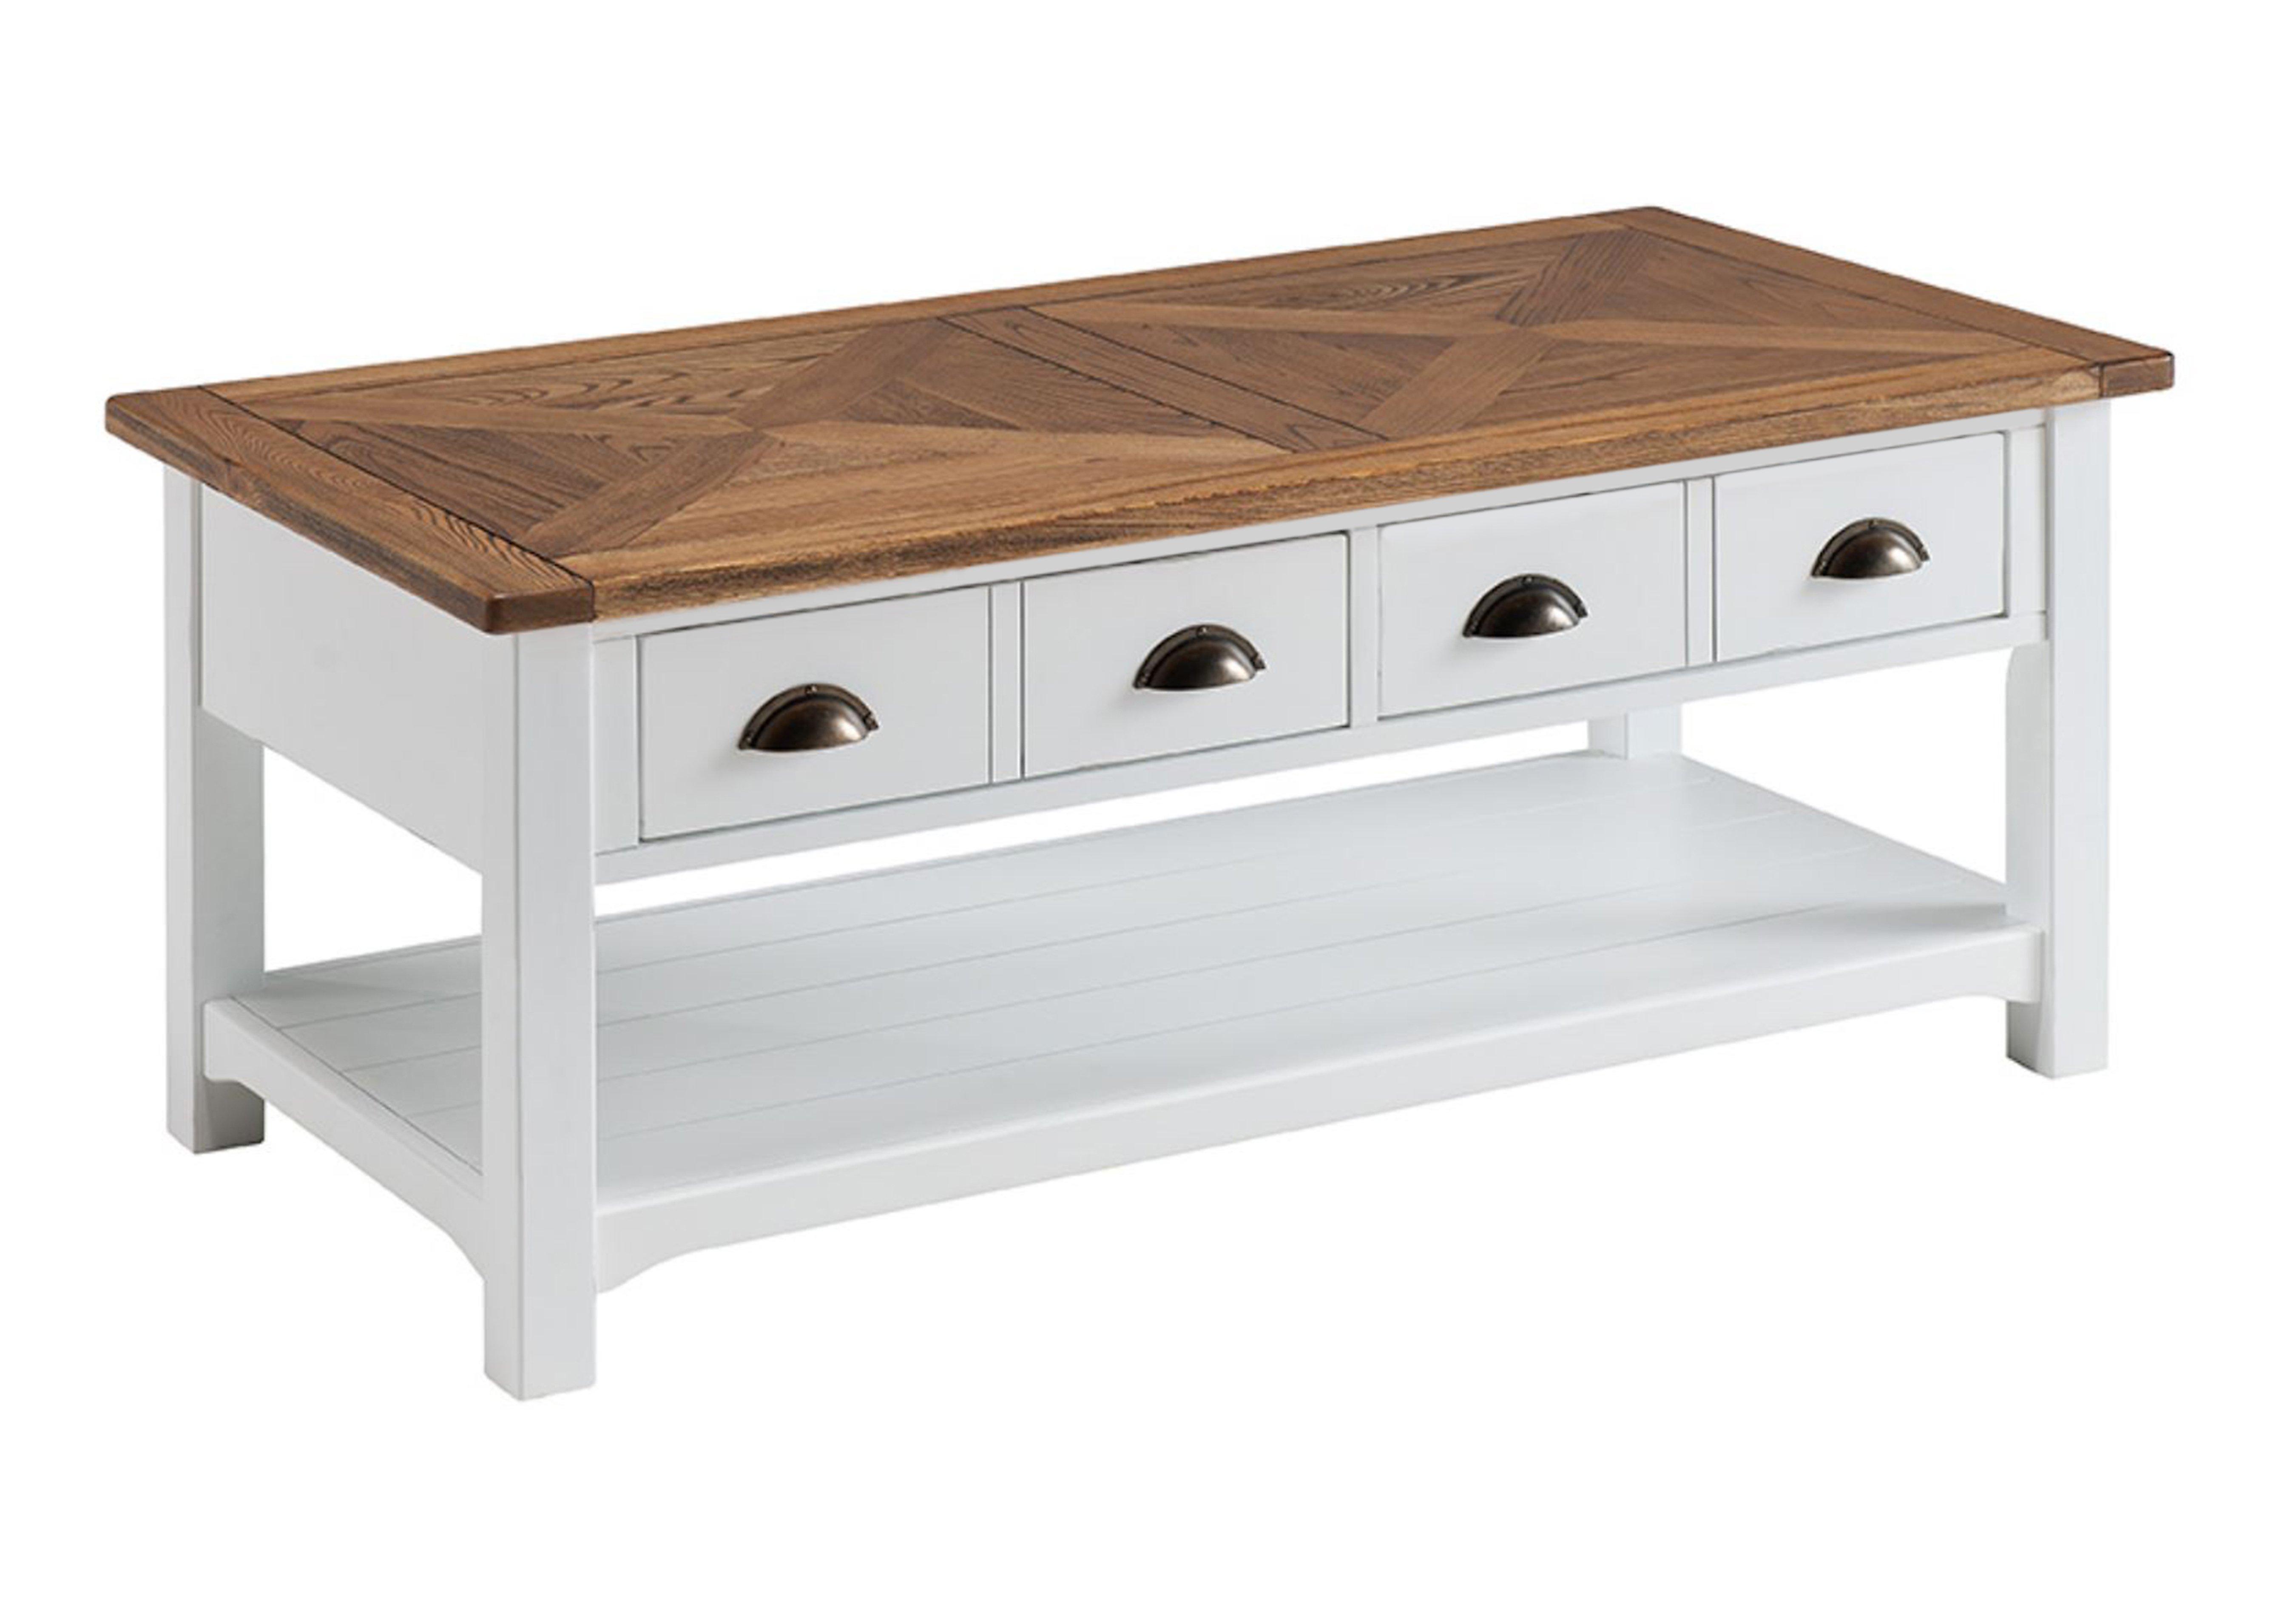 Furniture Village Coffee Table parquet coffee table - furnitureland - furniture village